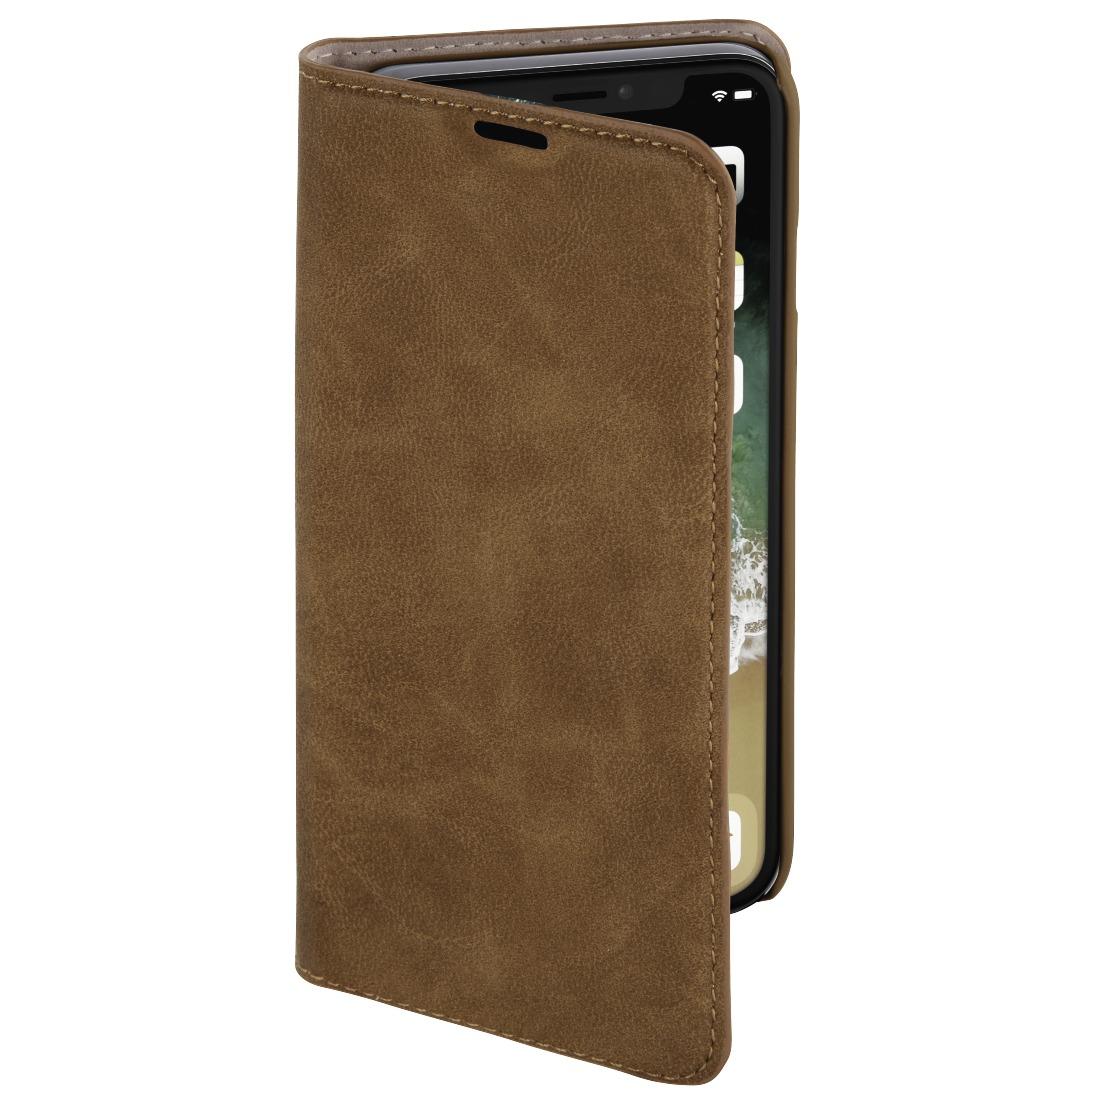 Hama telefoonhoesje Booklet guard Iphone XR bruin